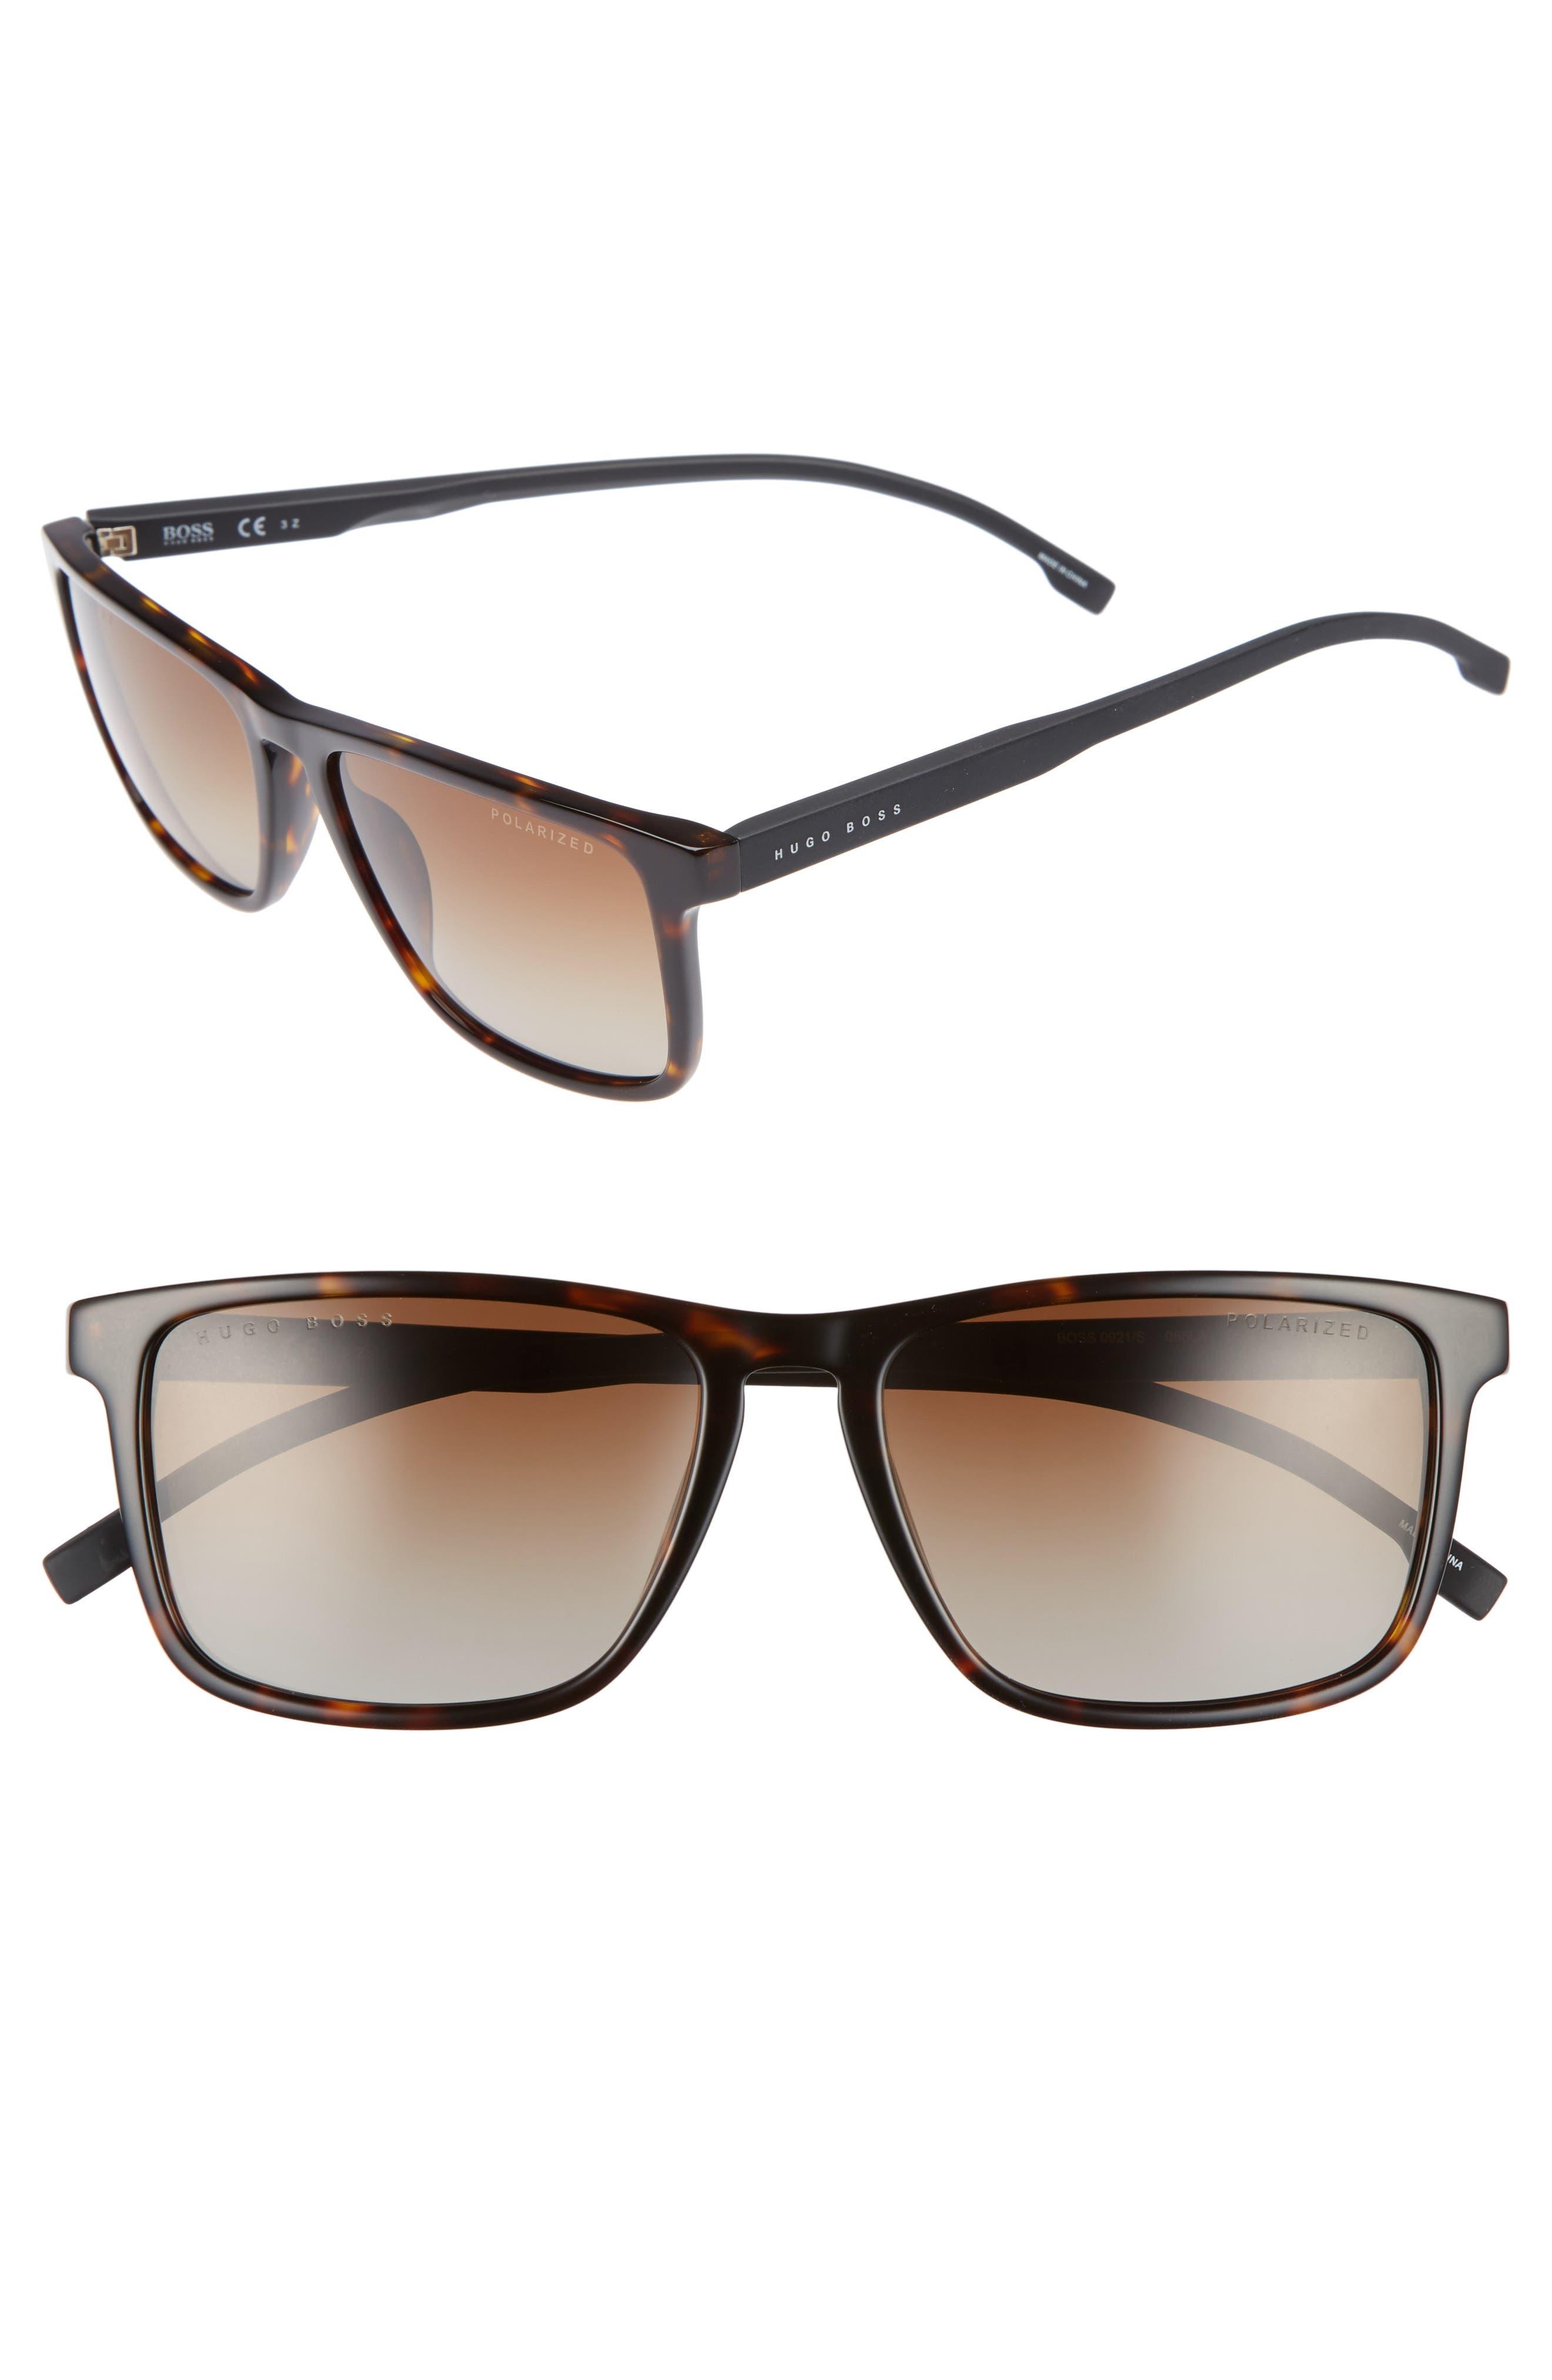 55mm Sunglasses,                         Main,                         color, Dark Havana/ Brown Pol